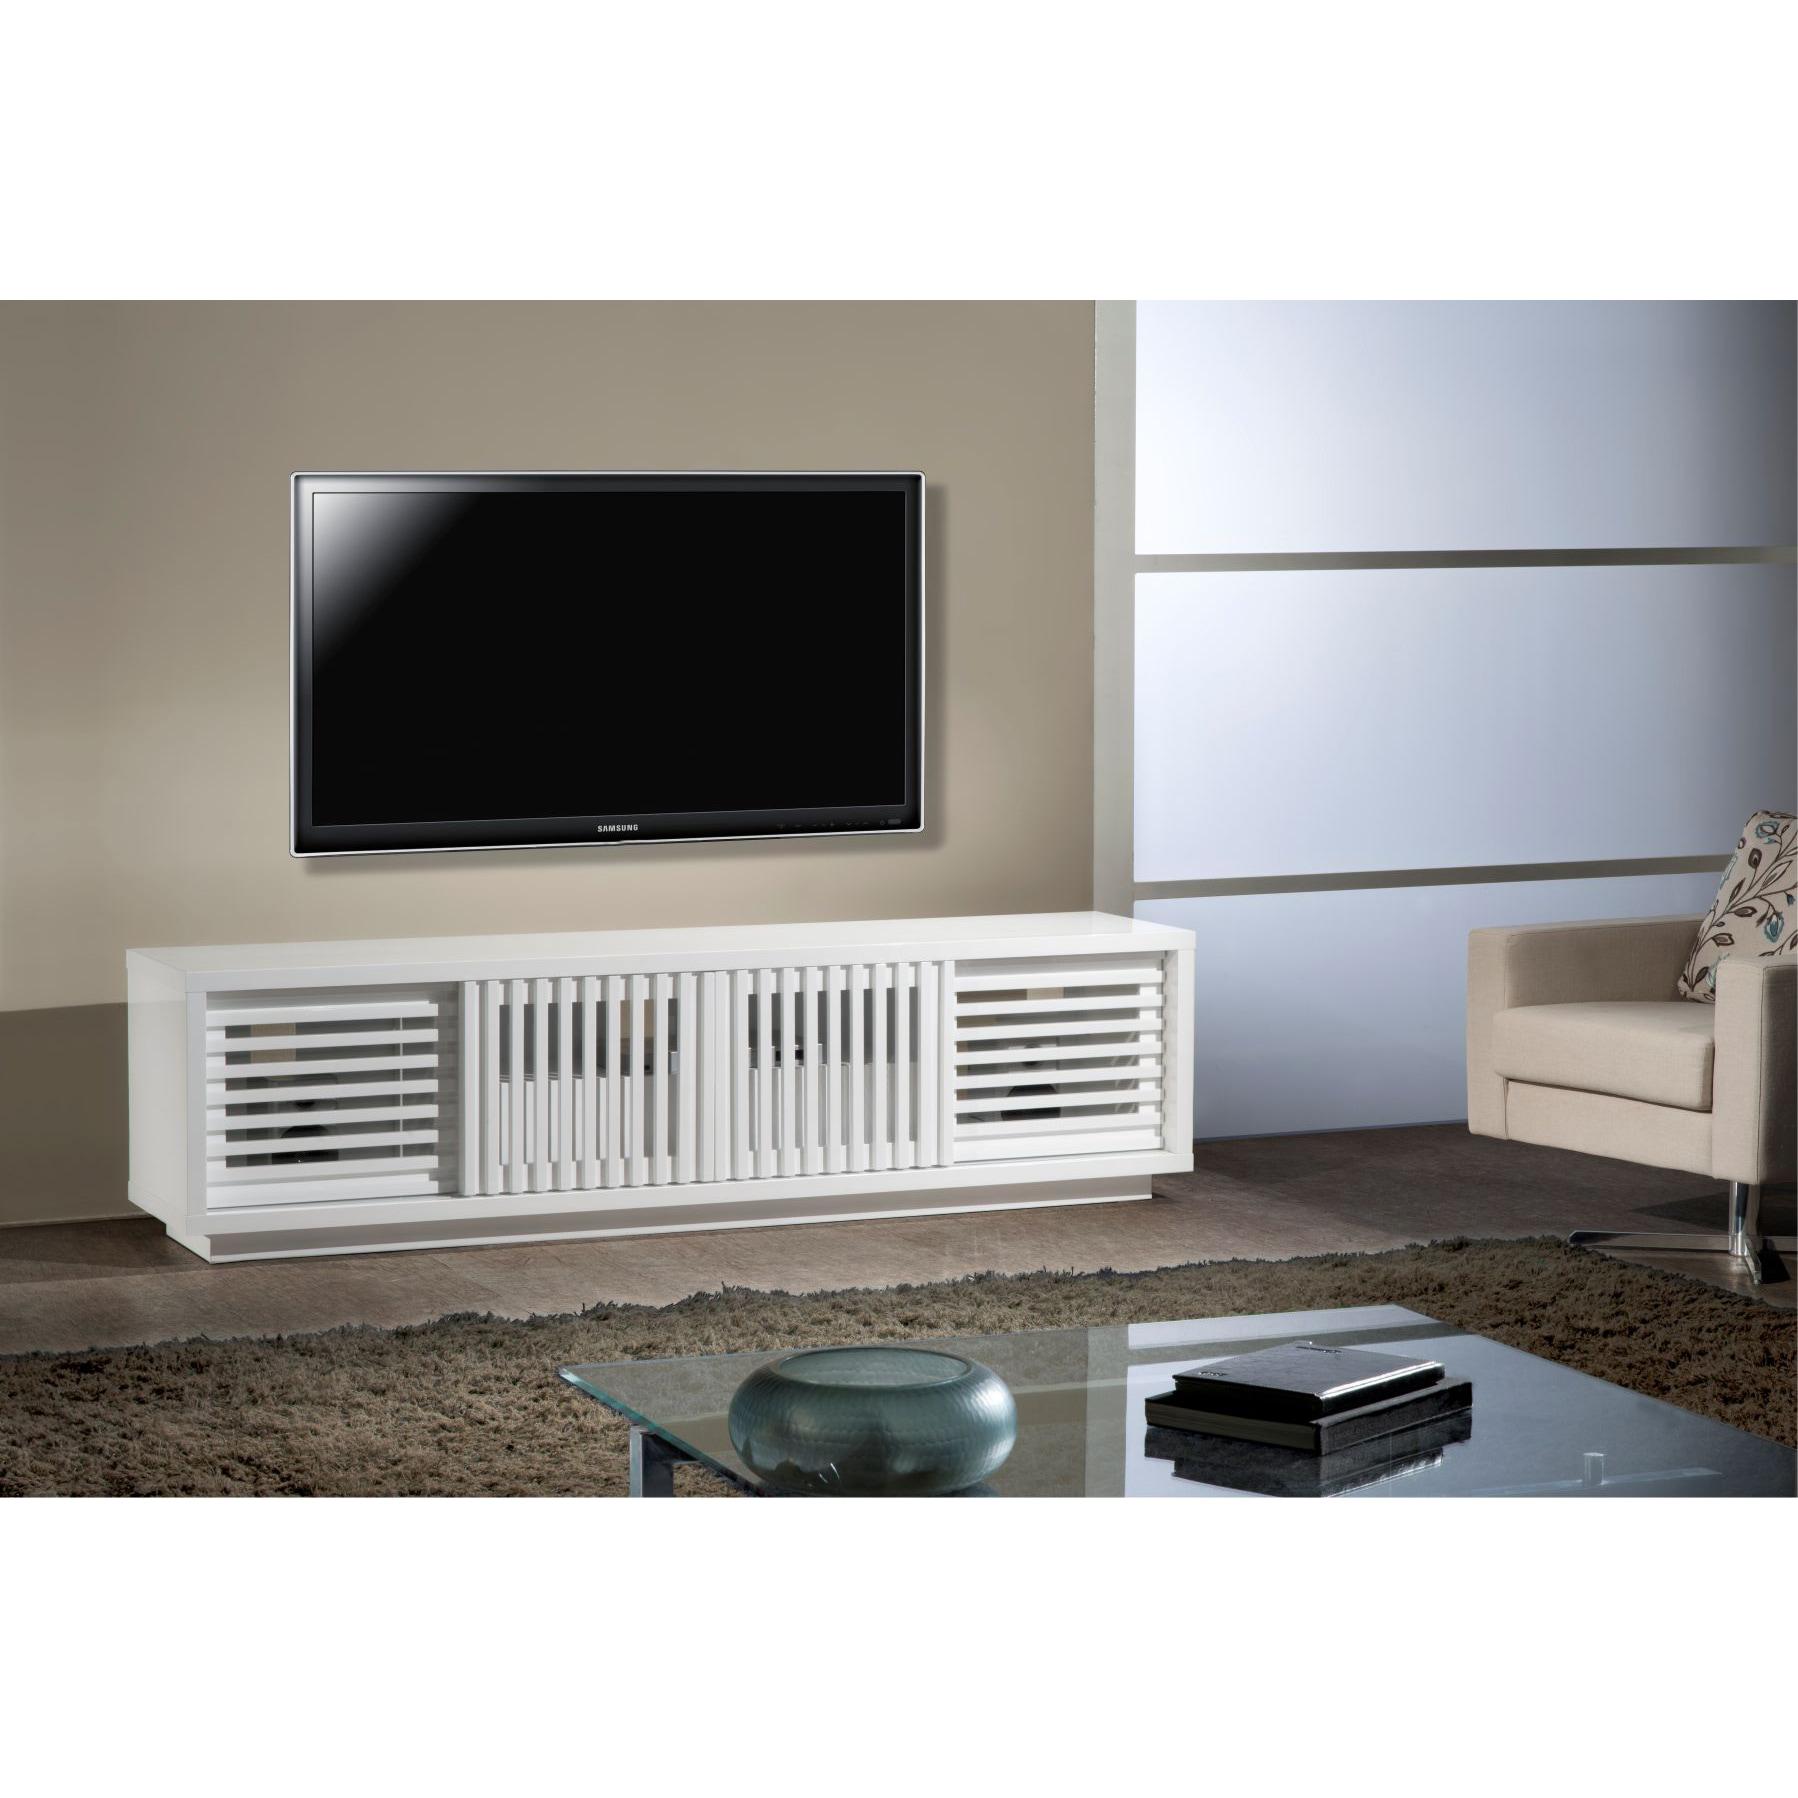 Shop Furnitech Contemporary High Gloss White Lacquer Tv Stand Media